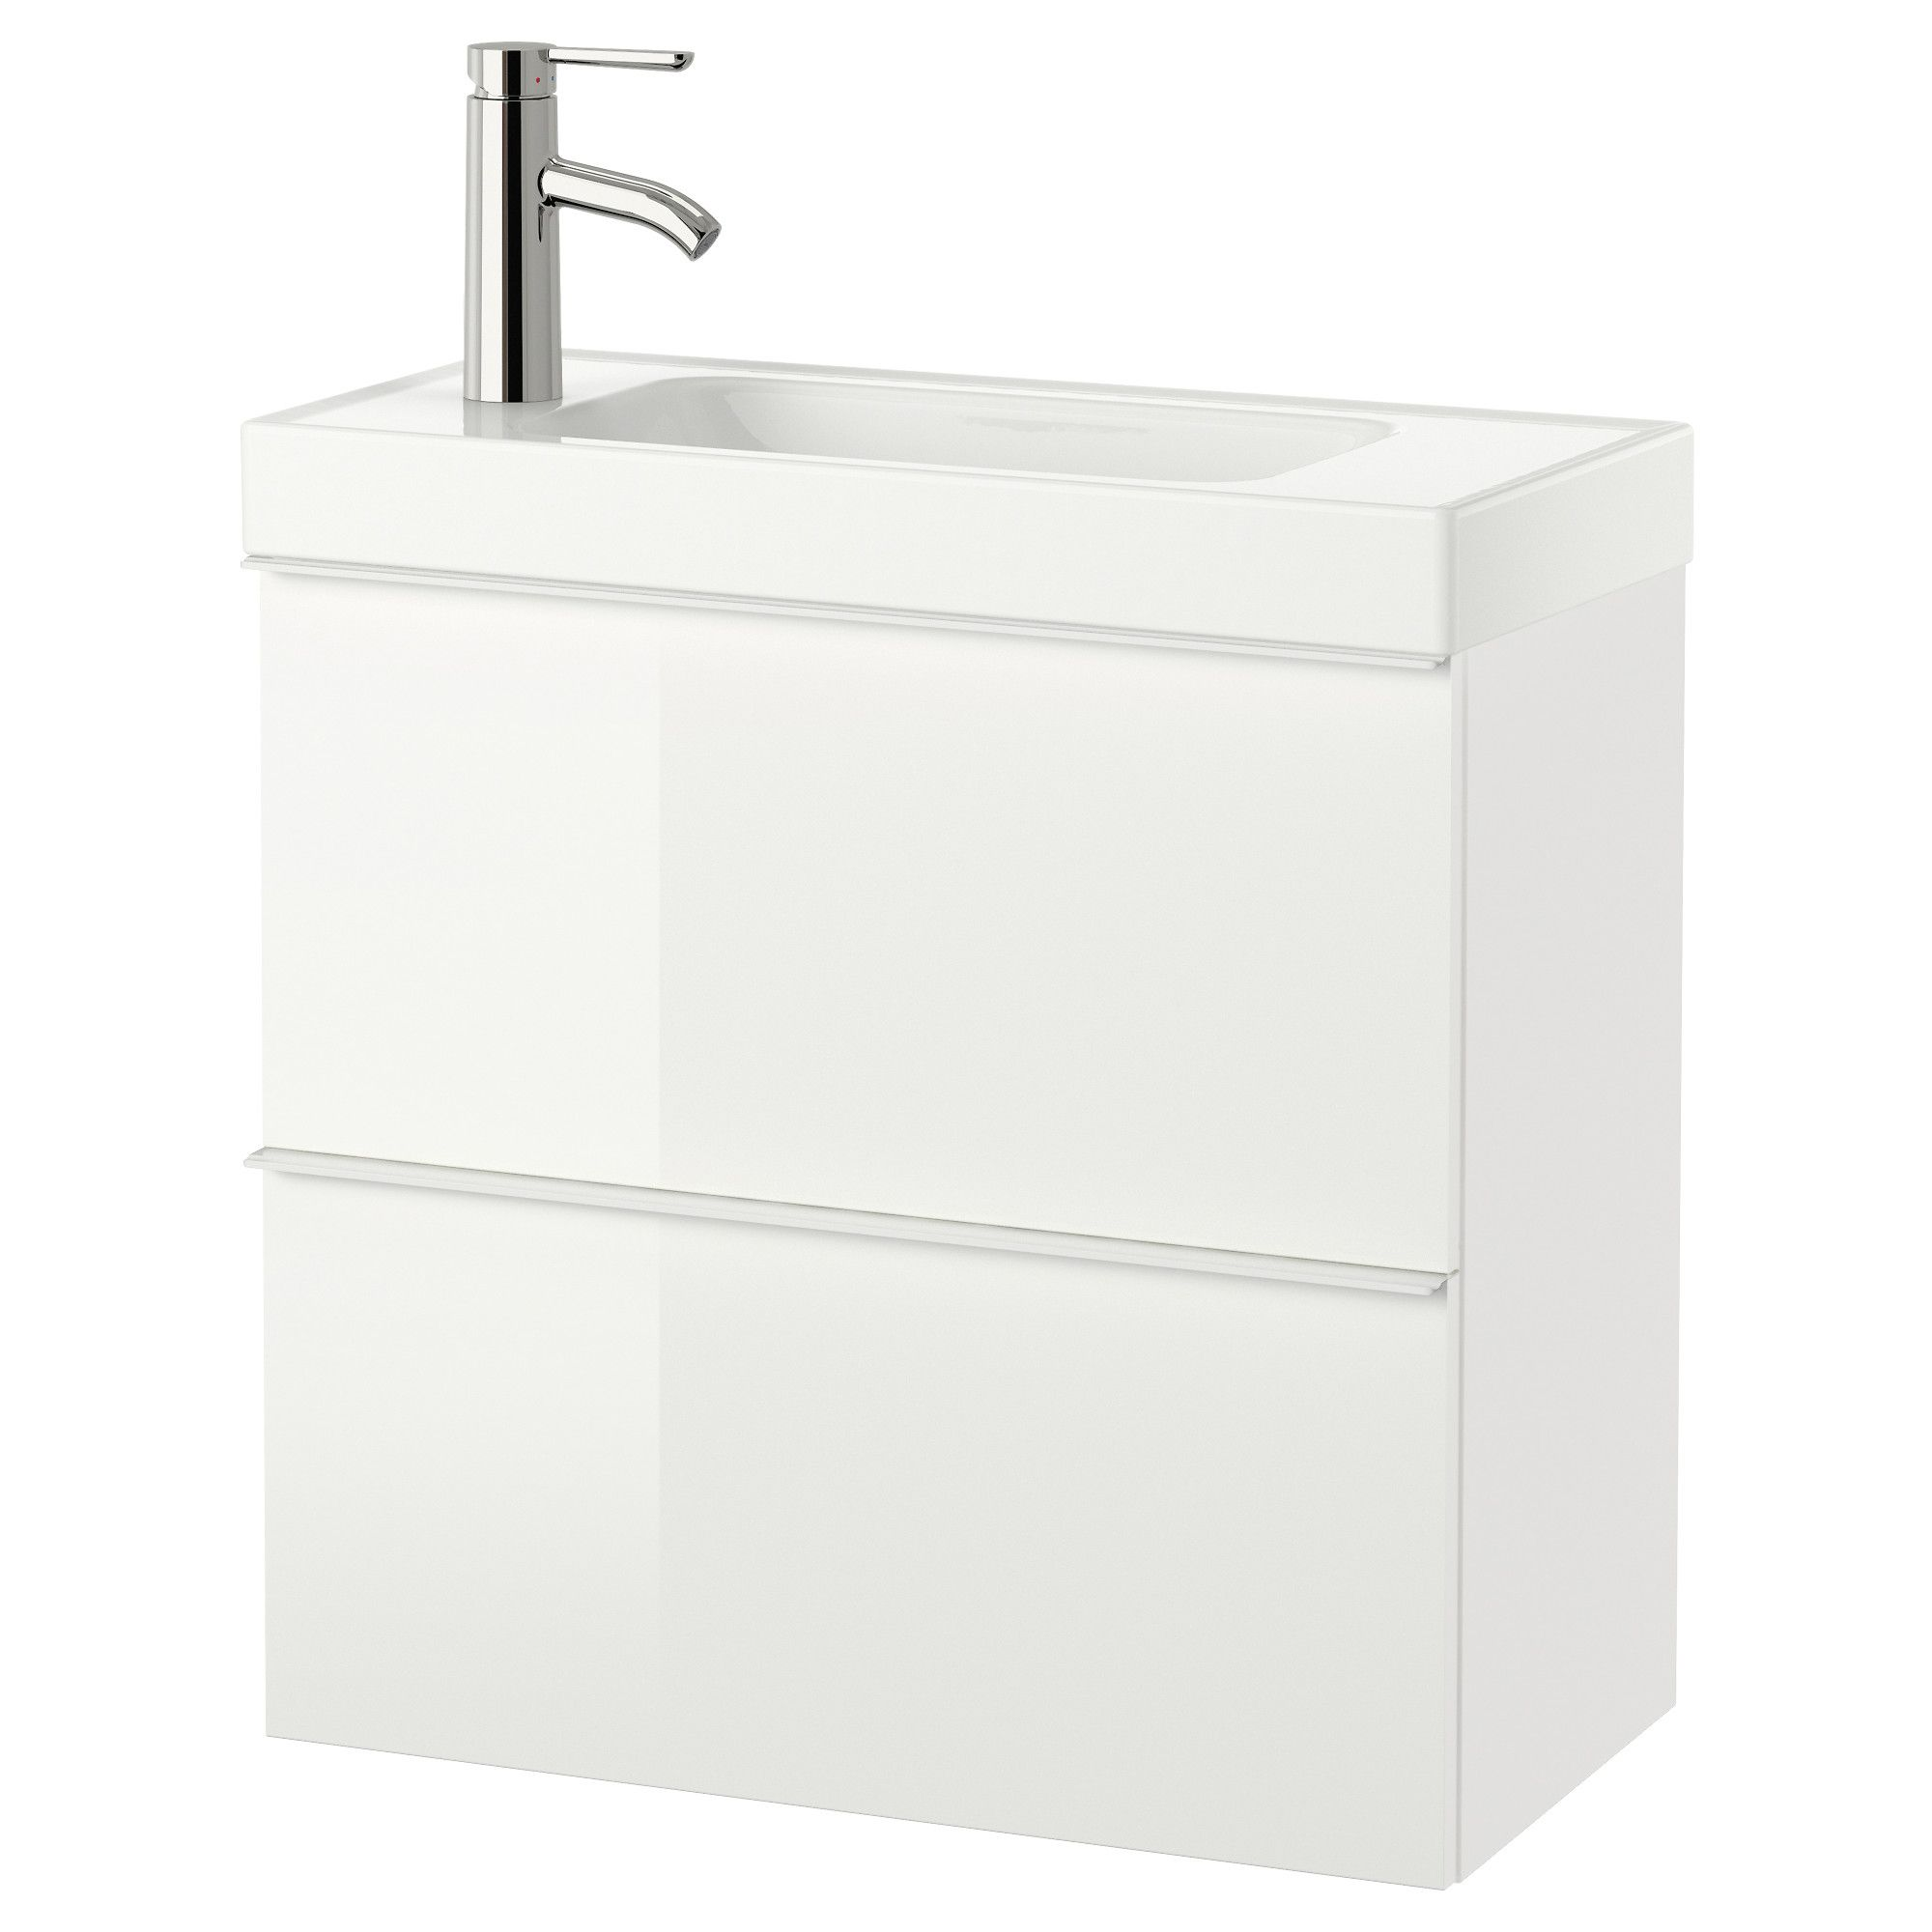 brÅviken/godmorgon meuble lavabo 2tir brillant blanc 60x34x65 cm